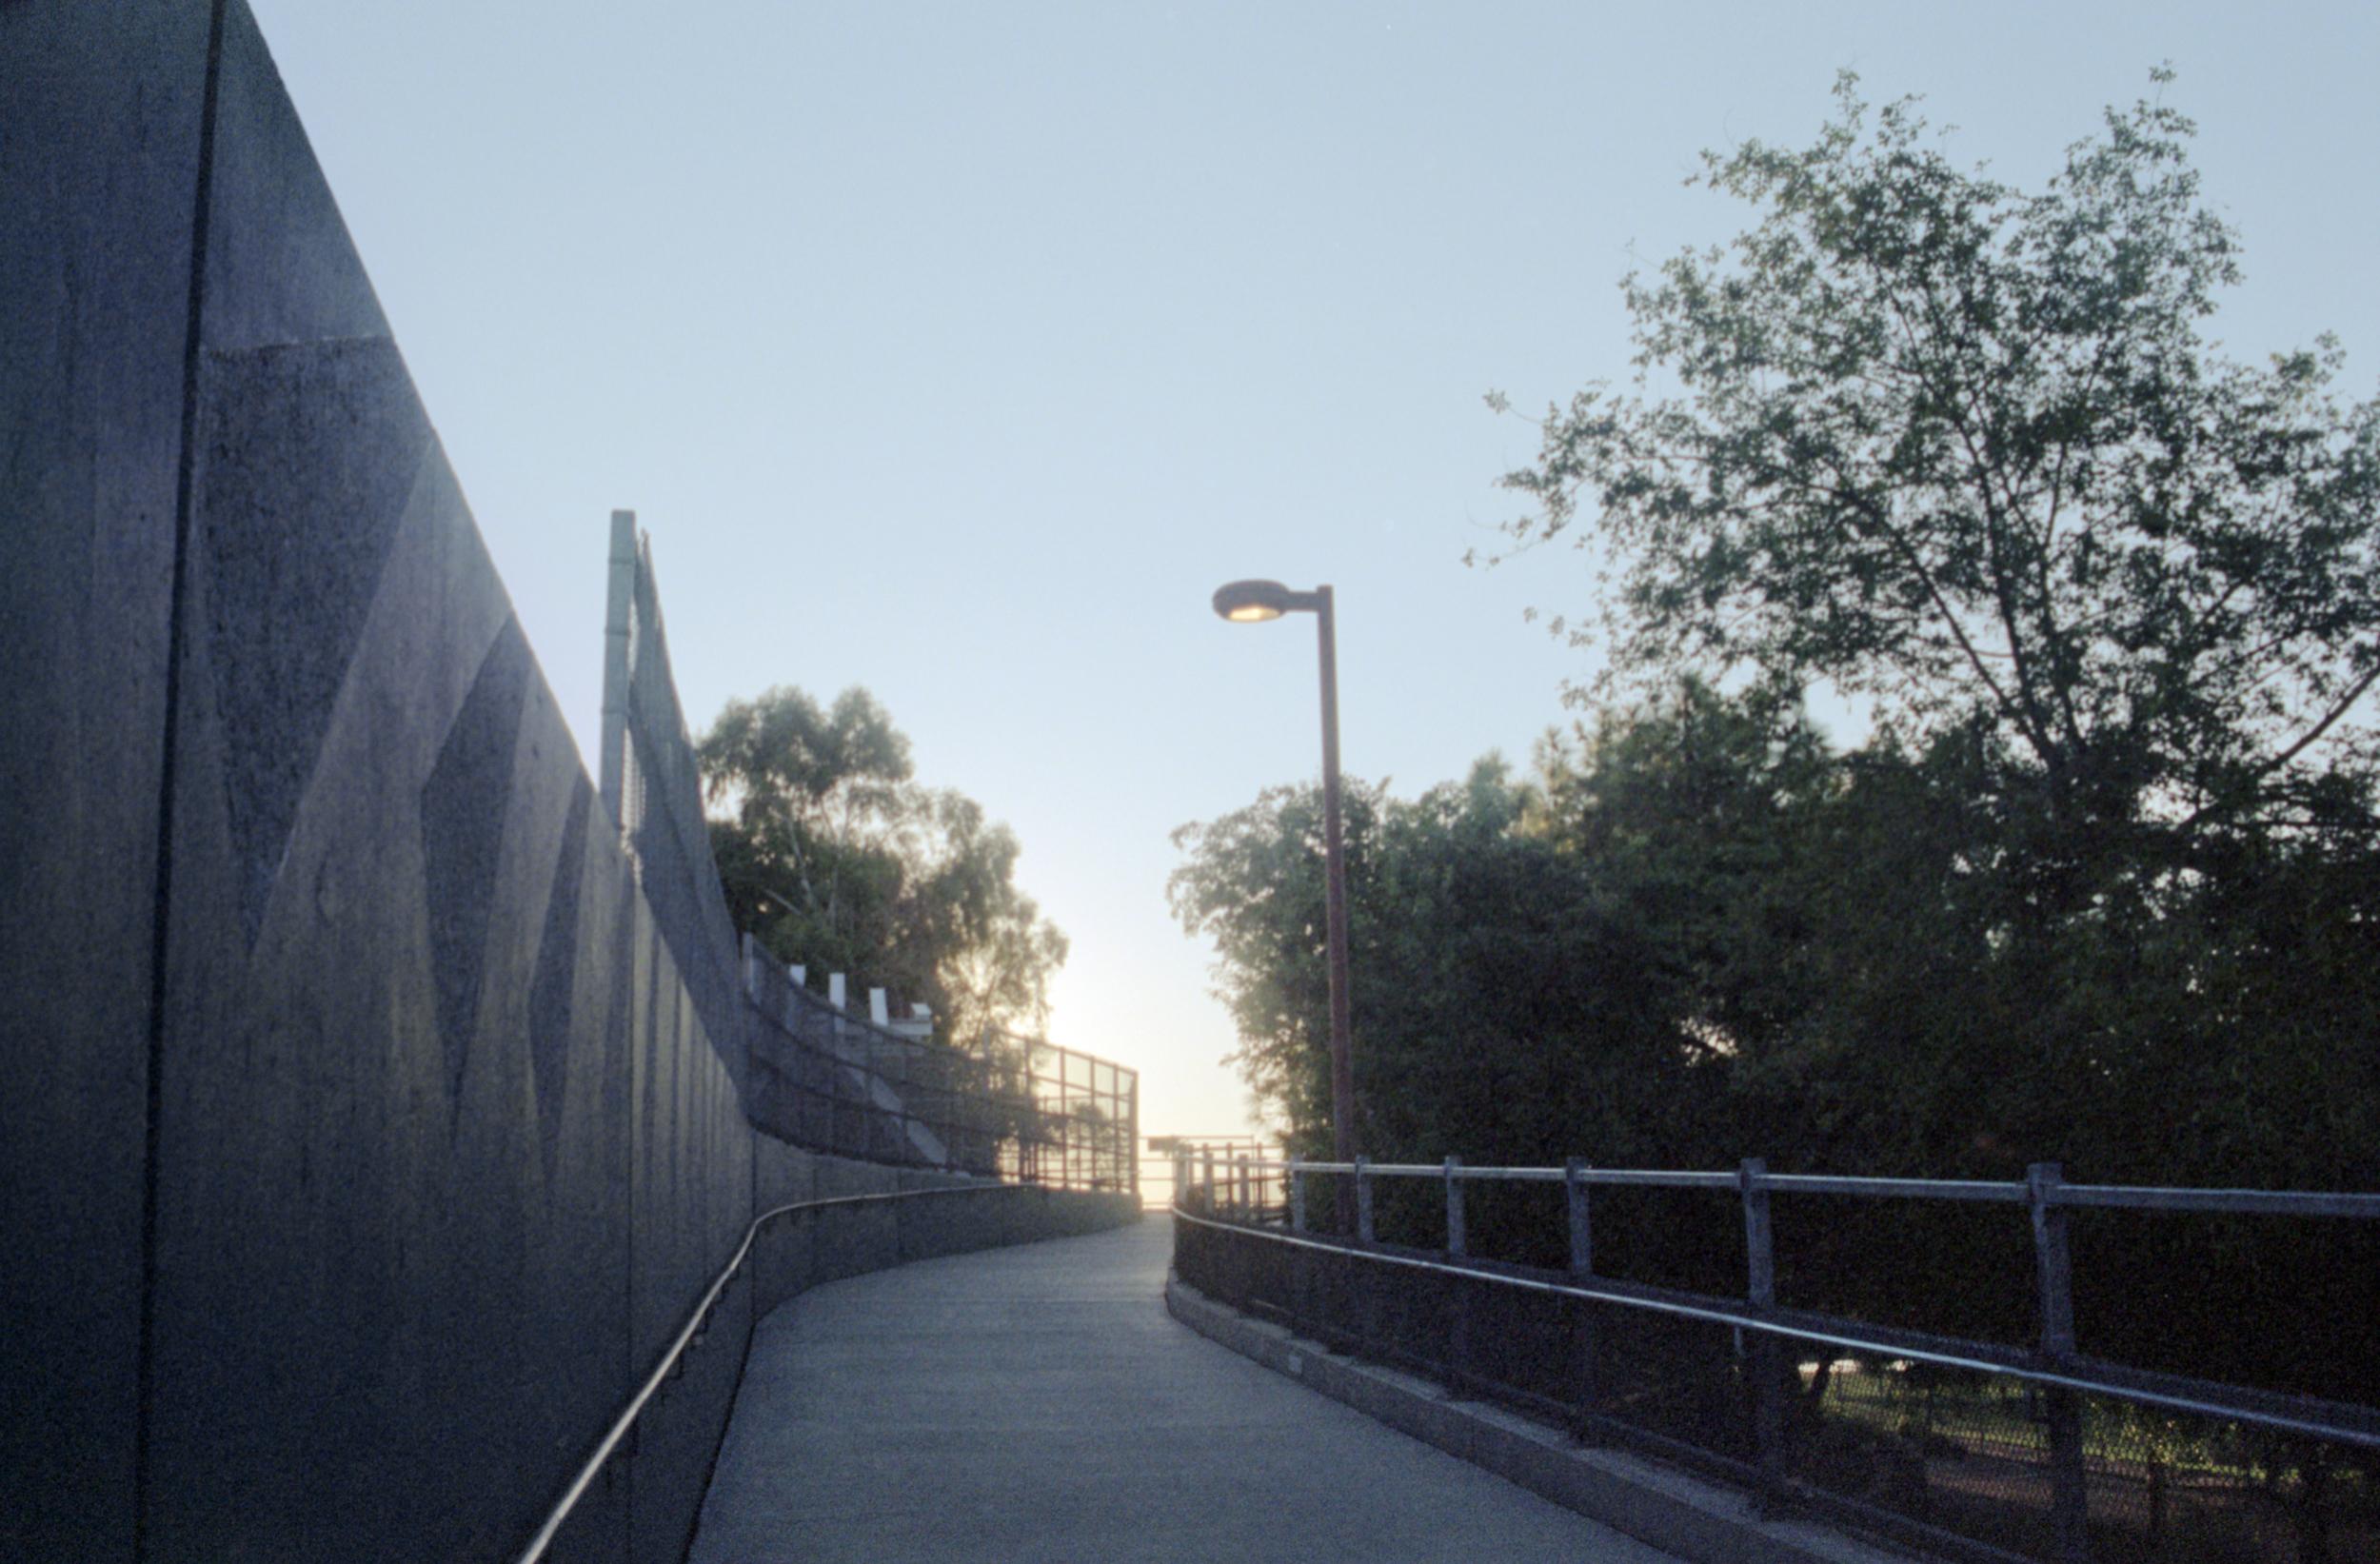 sun at flyover ramp-print1.jpeg